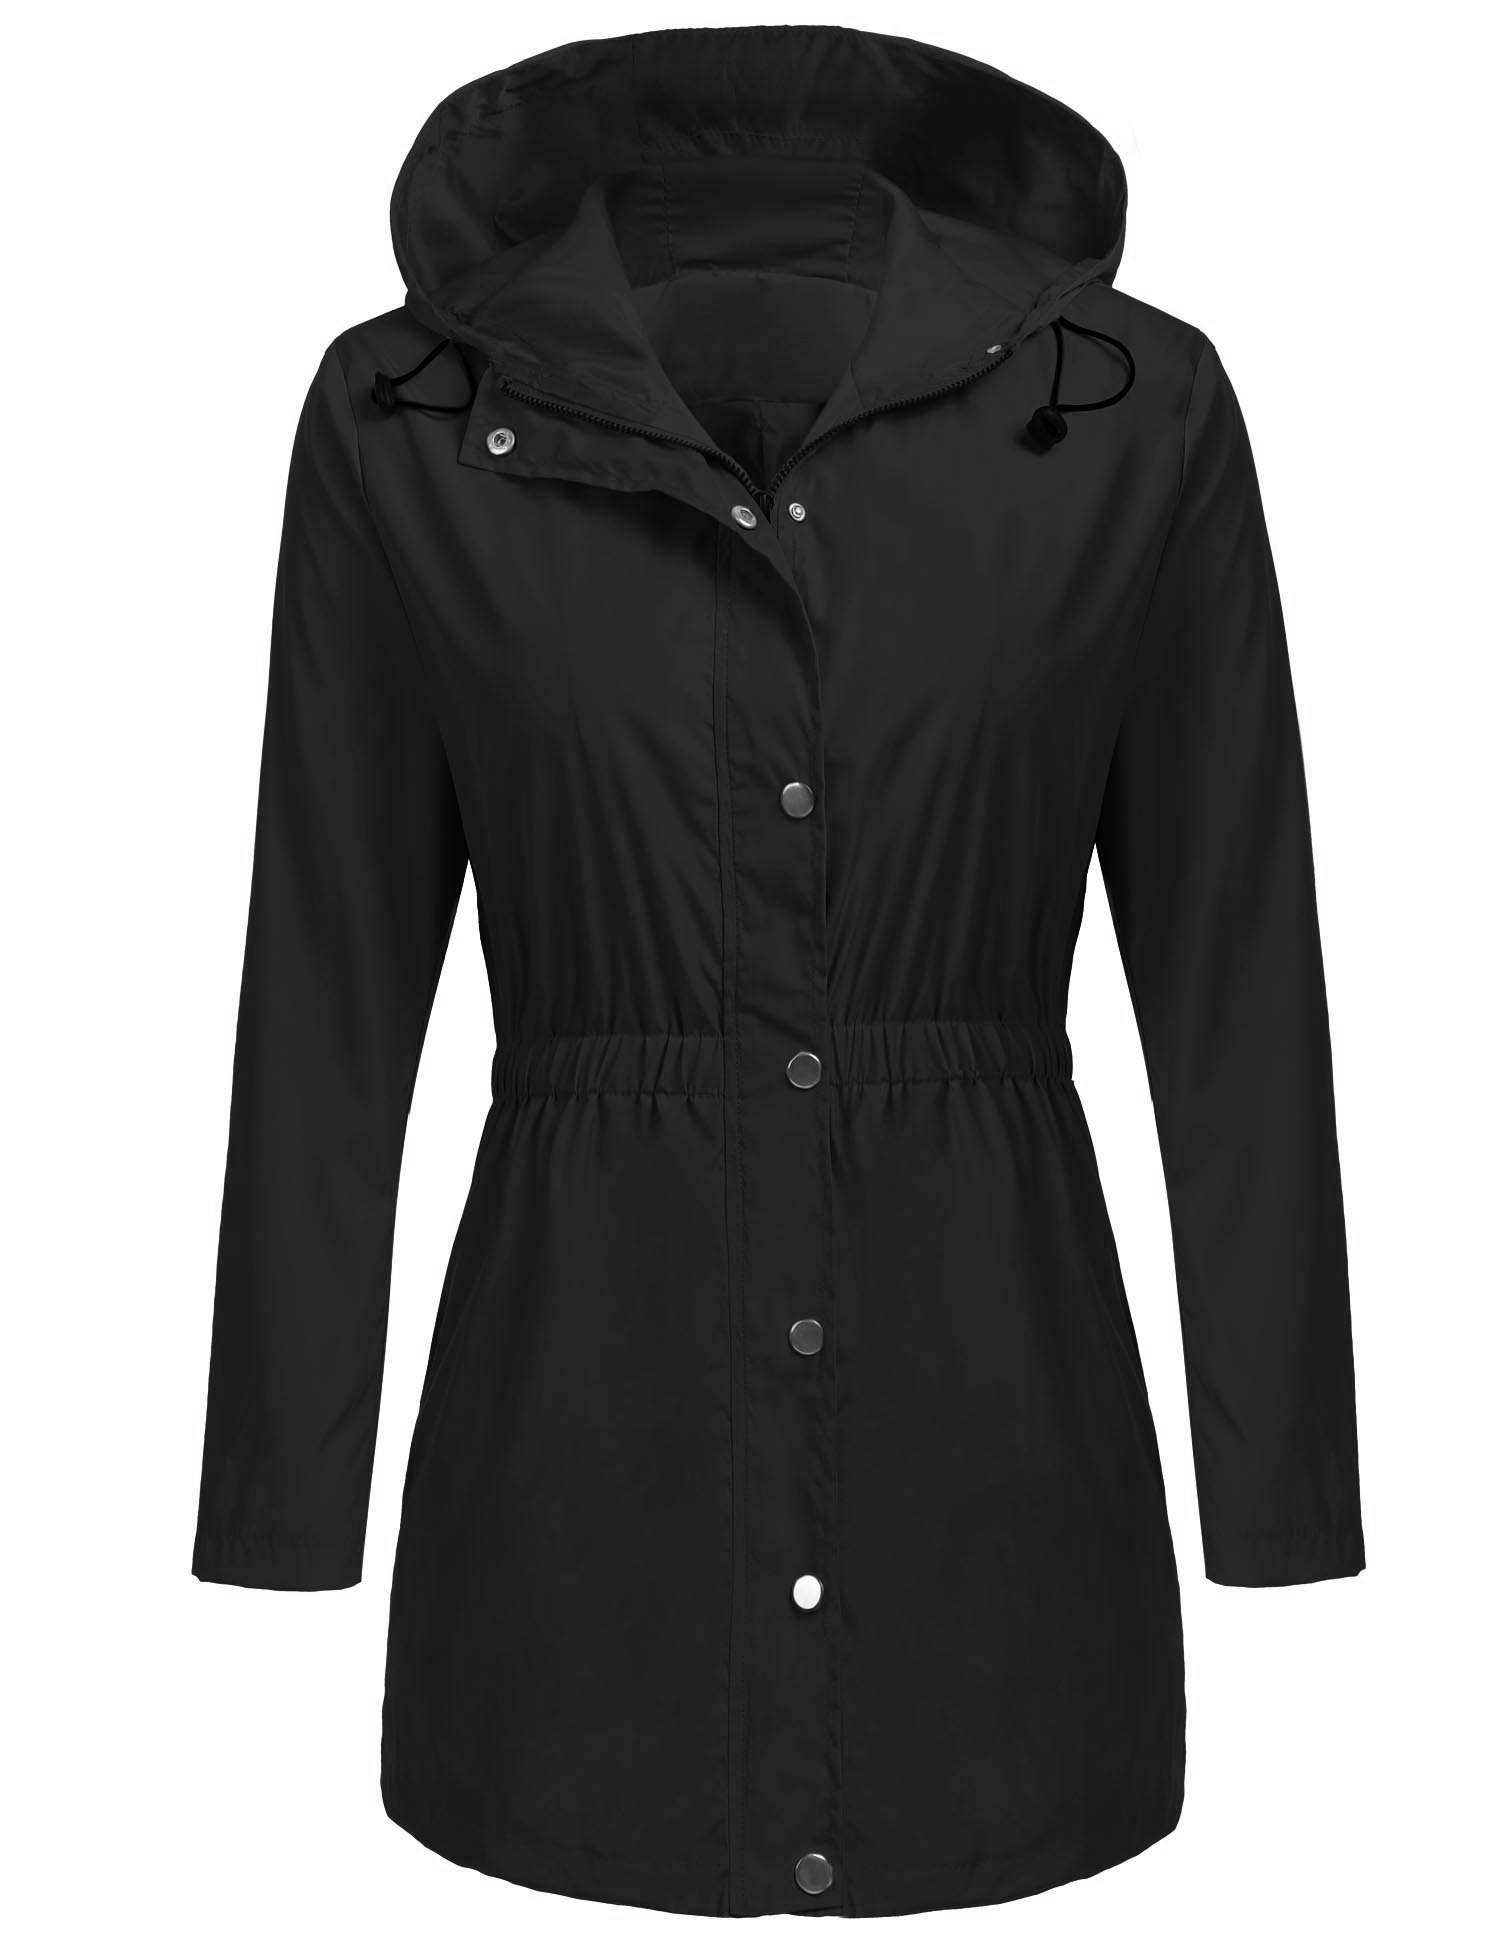 happilina Womens Lightweight Travel Trench Waterproof Raincoat Hoodie Windproof Hiking Coat Black XL